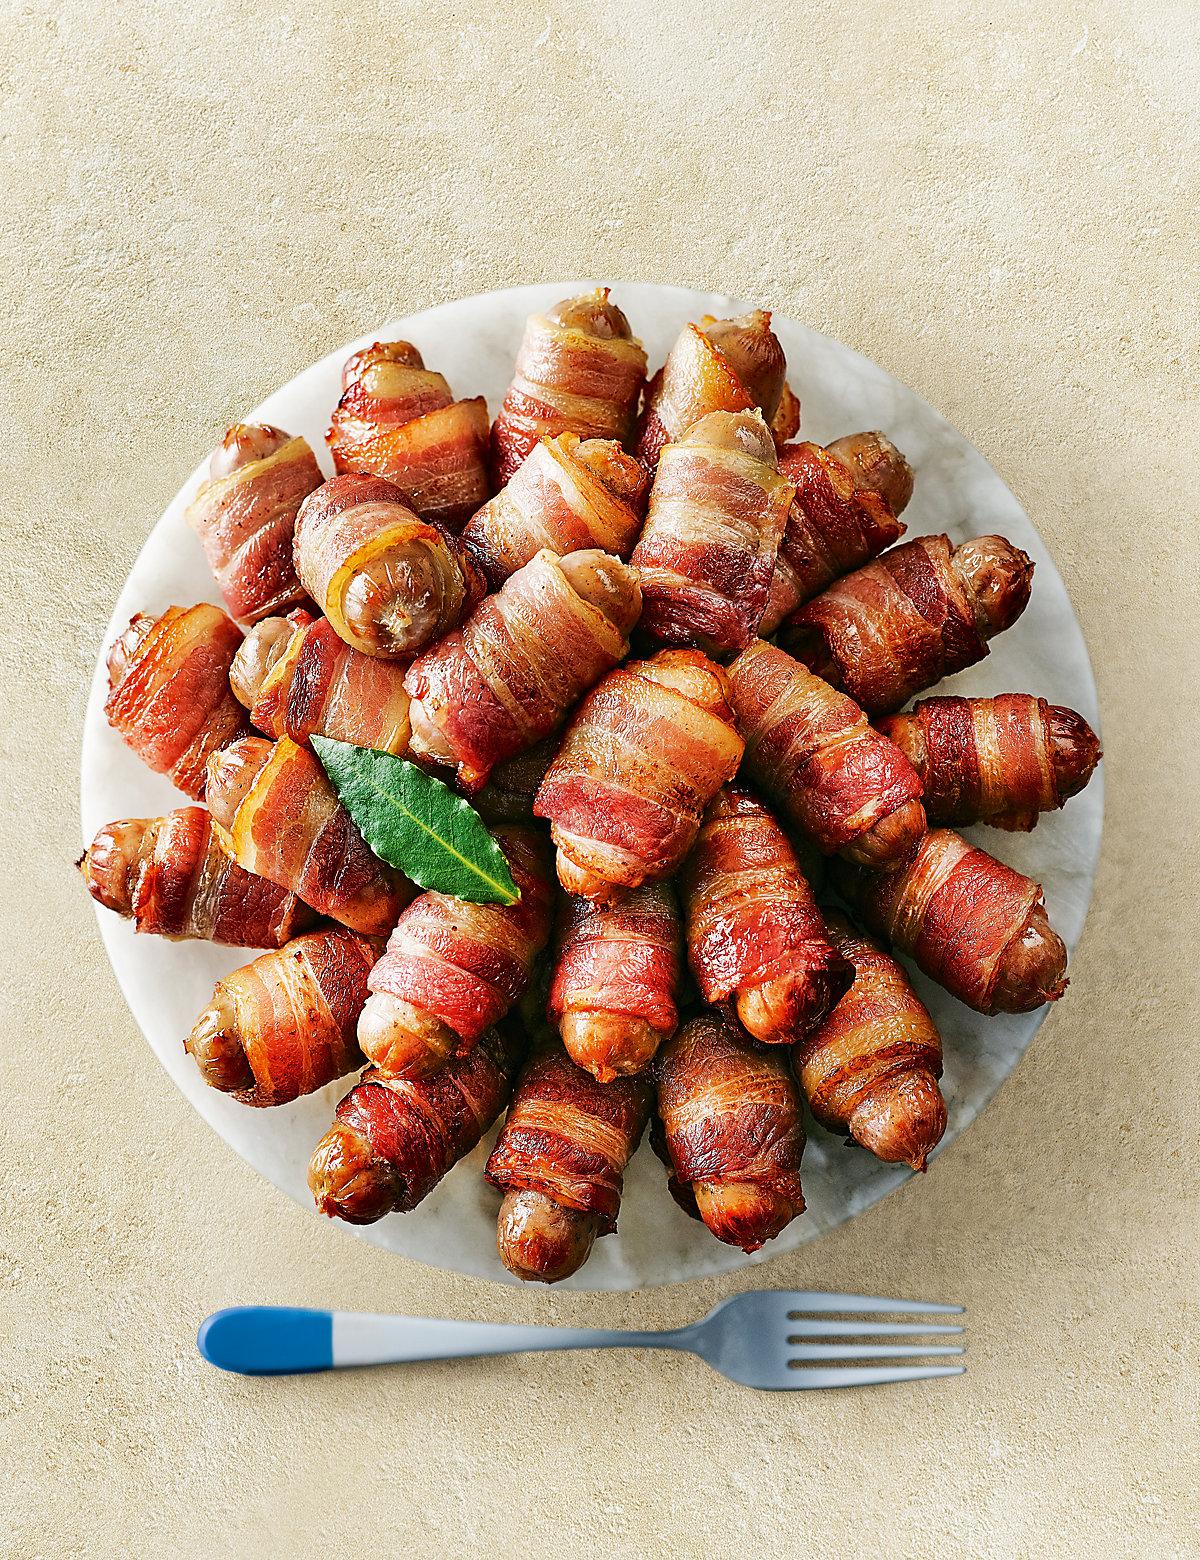 32 Bacon & Sausage Rolls